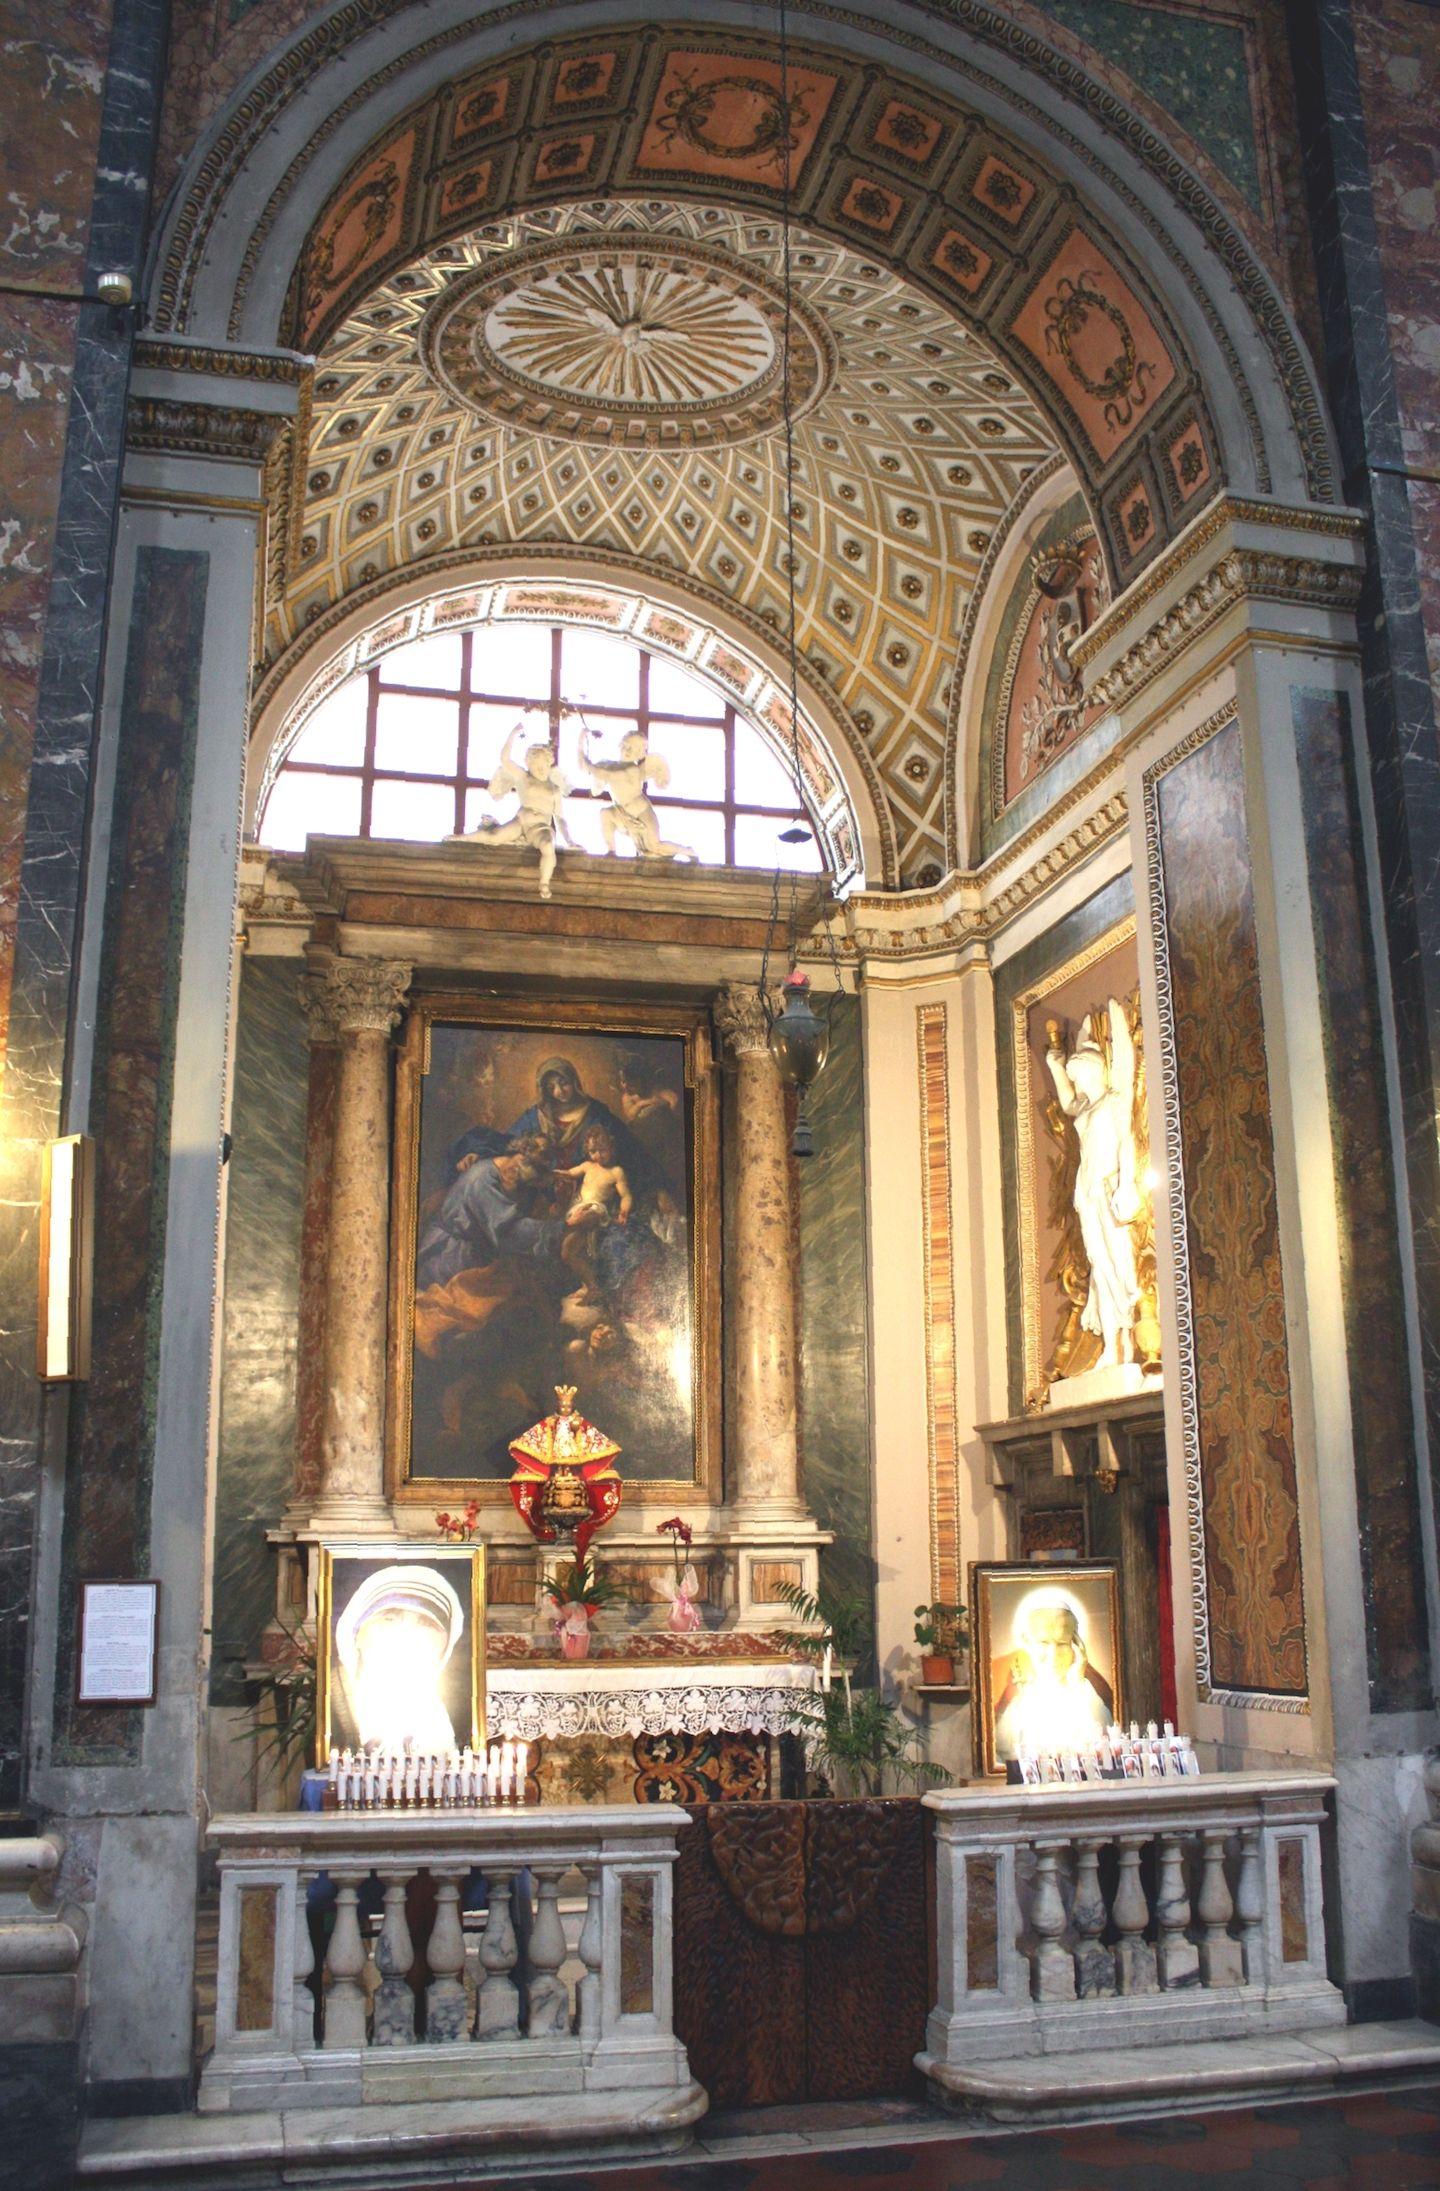 Gesu e maria rome chapel of st joseph the altarpiece